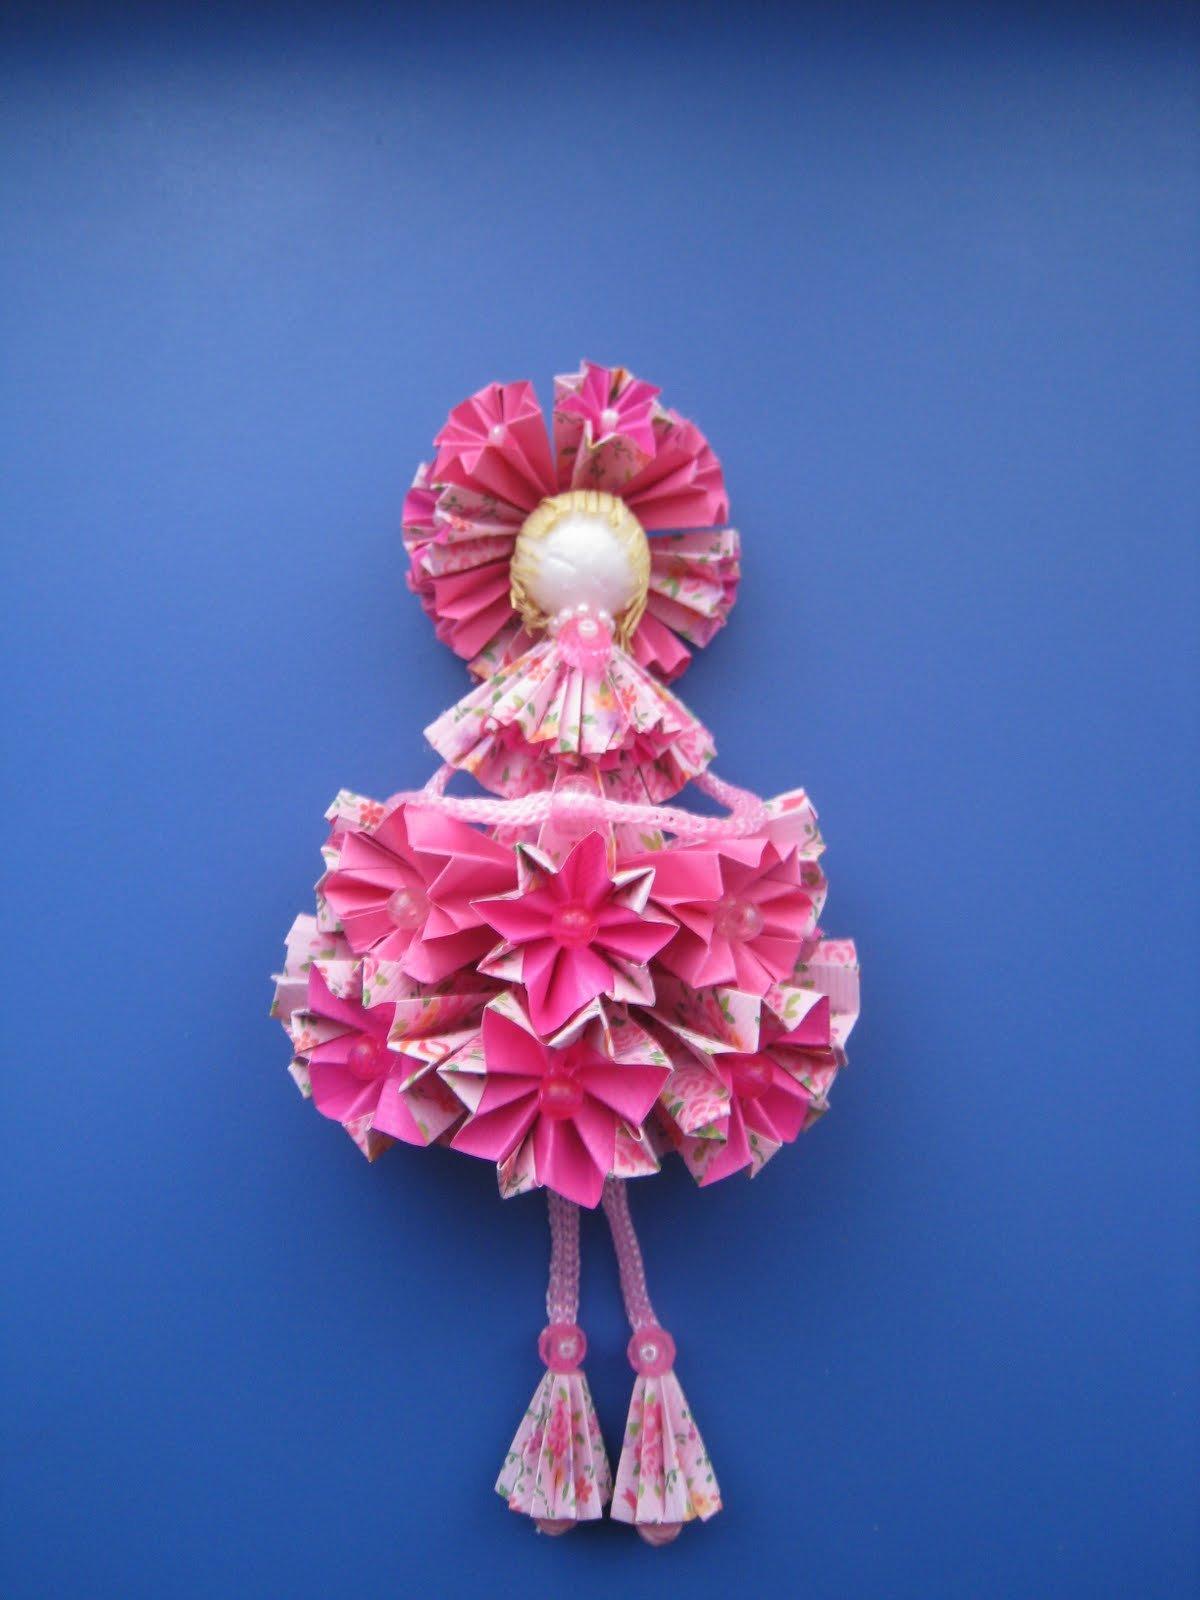 Объёмная кукла из бумаги мастер класс